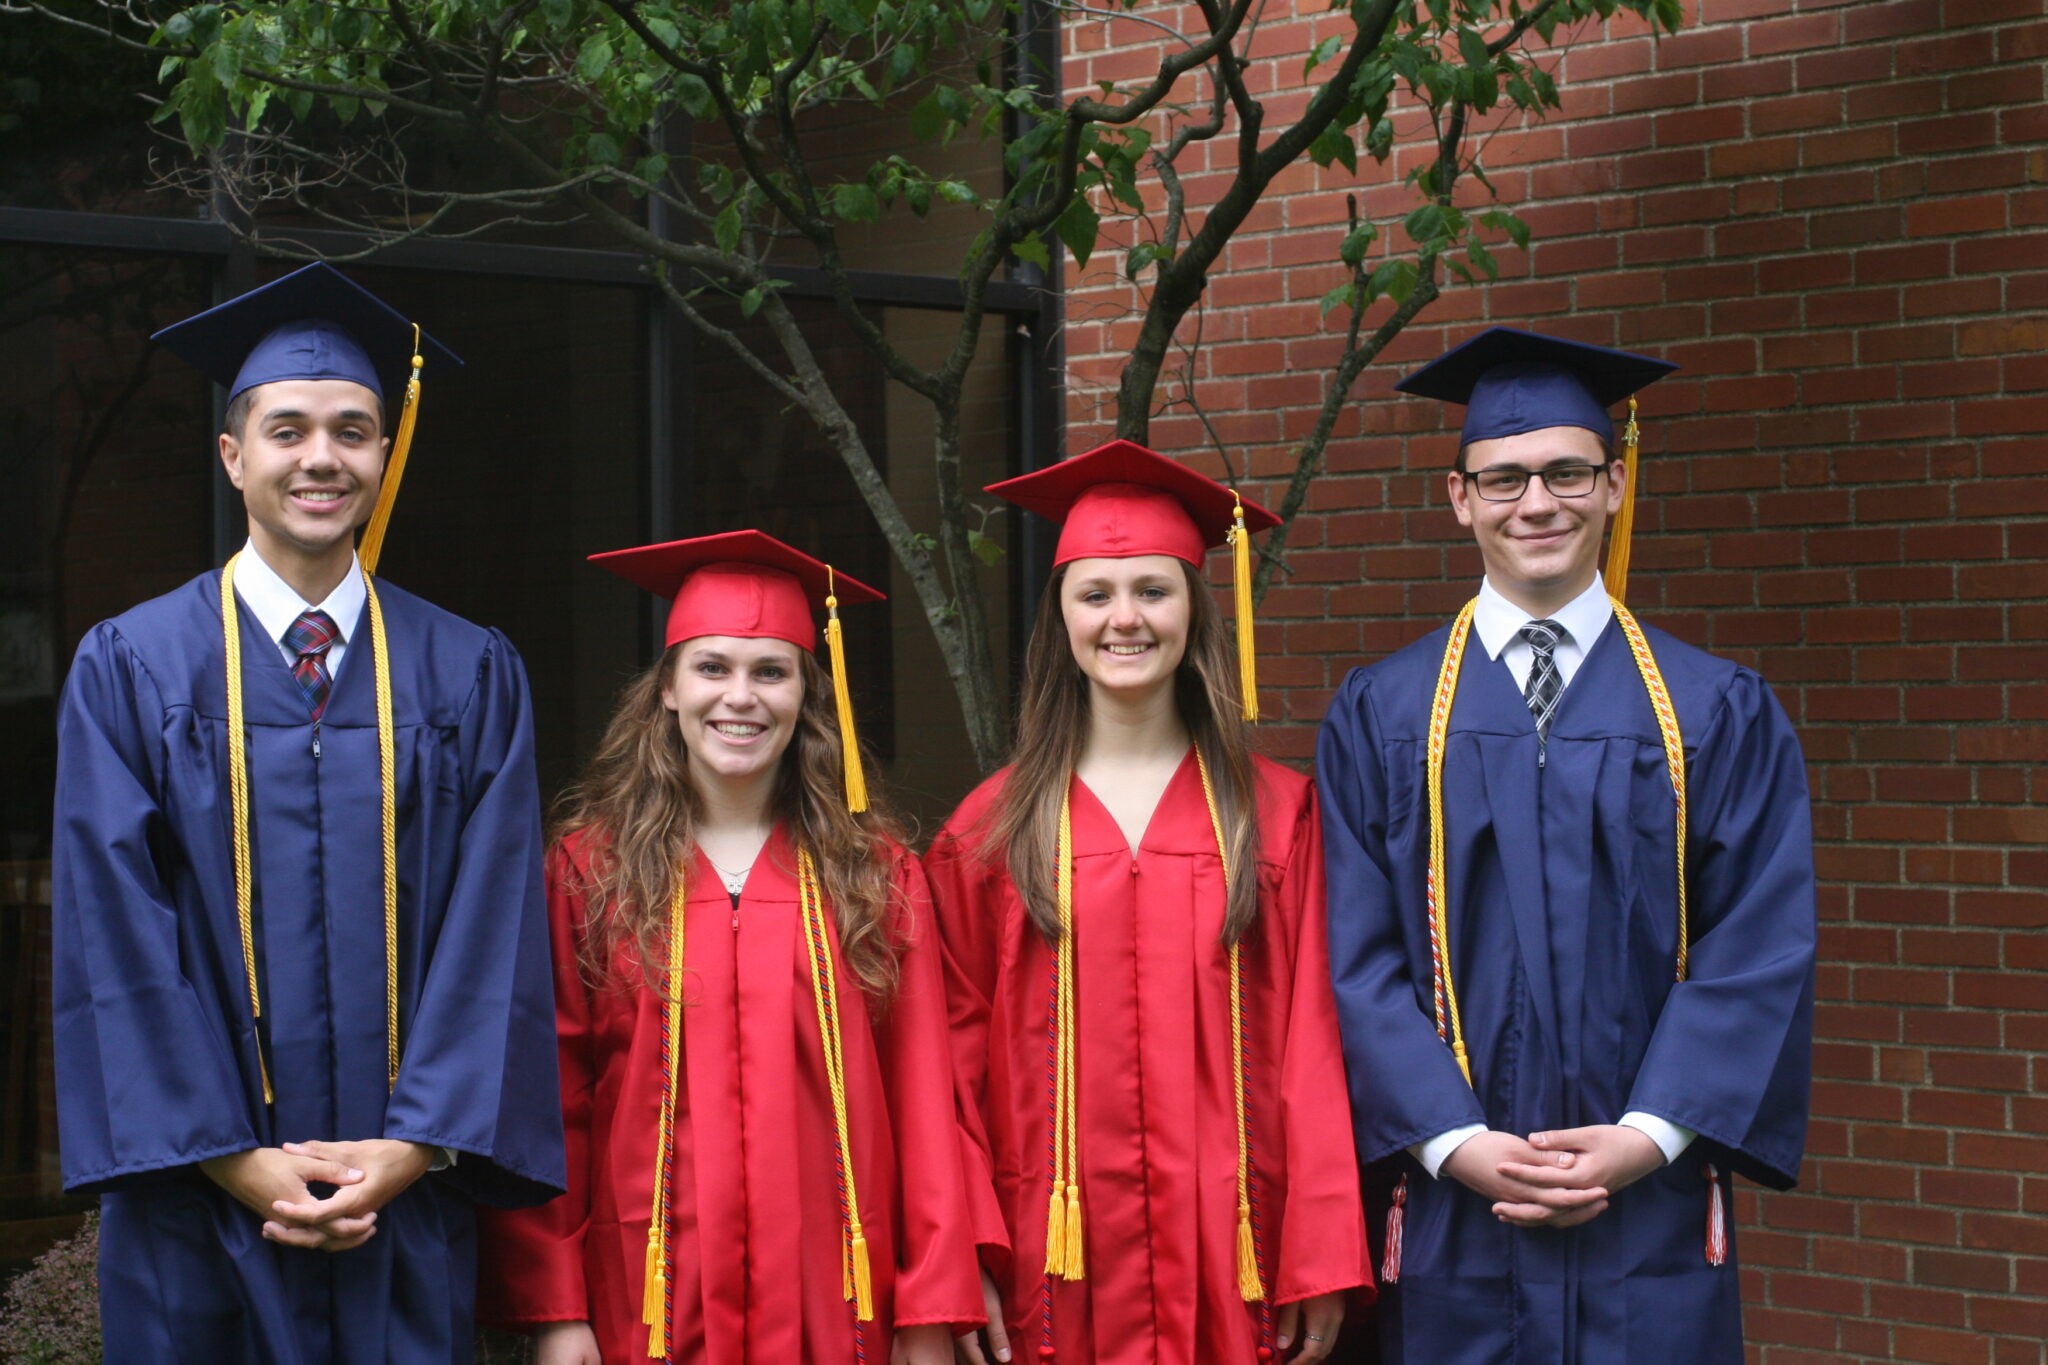 Congratulations Valedictorians And Salutatorian Of The Class Of 2016 Bishop Hartley High School As revealed in best friend.worst nightmare. bishop hartley